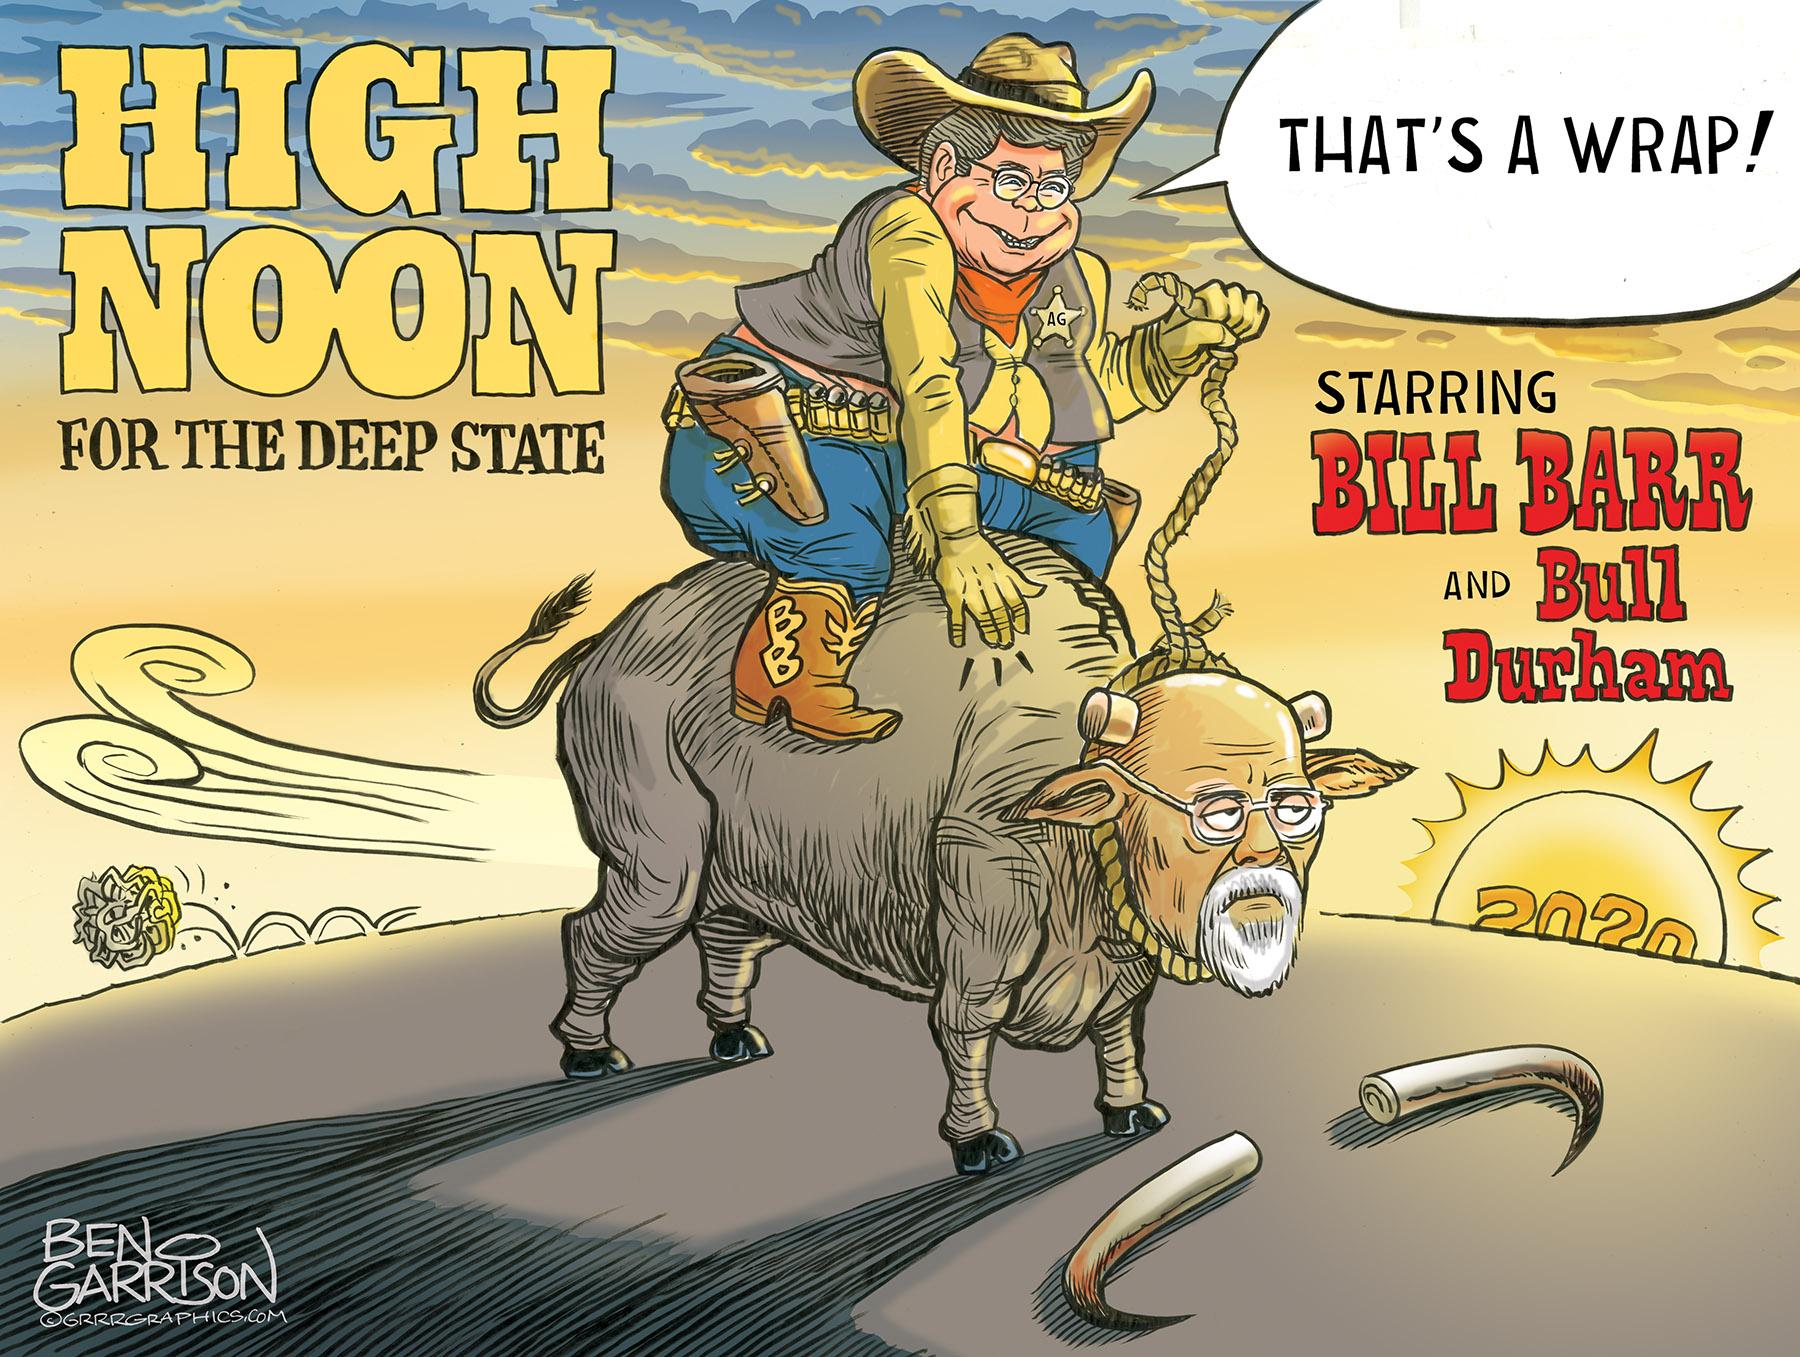 Bill Barr and Durham